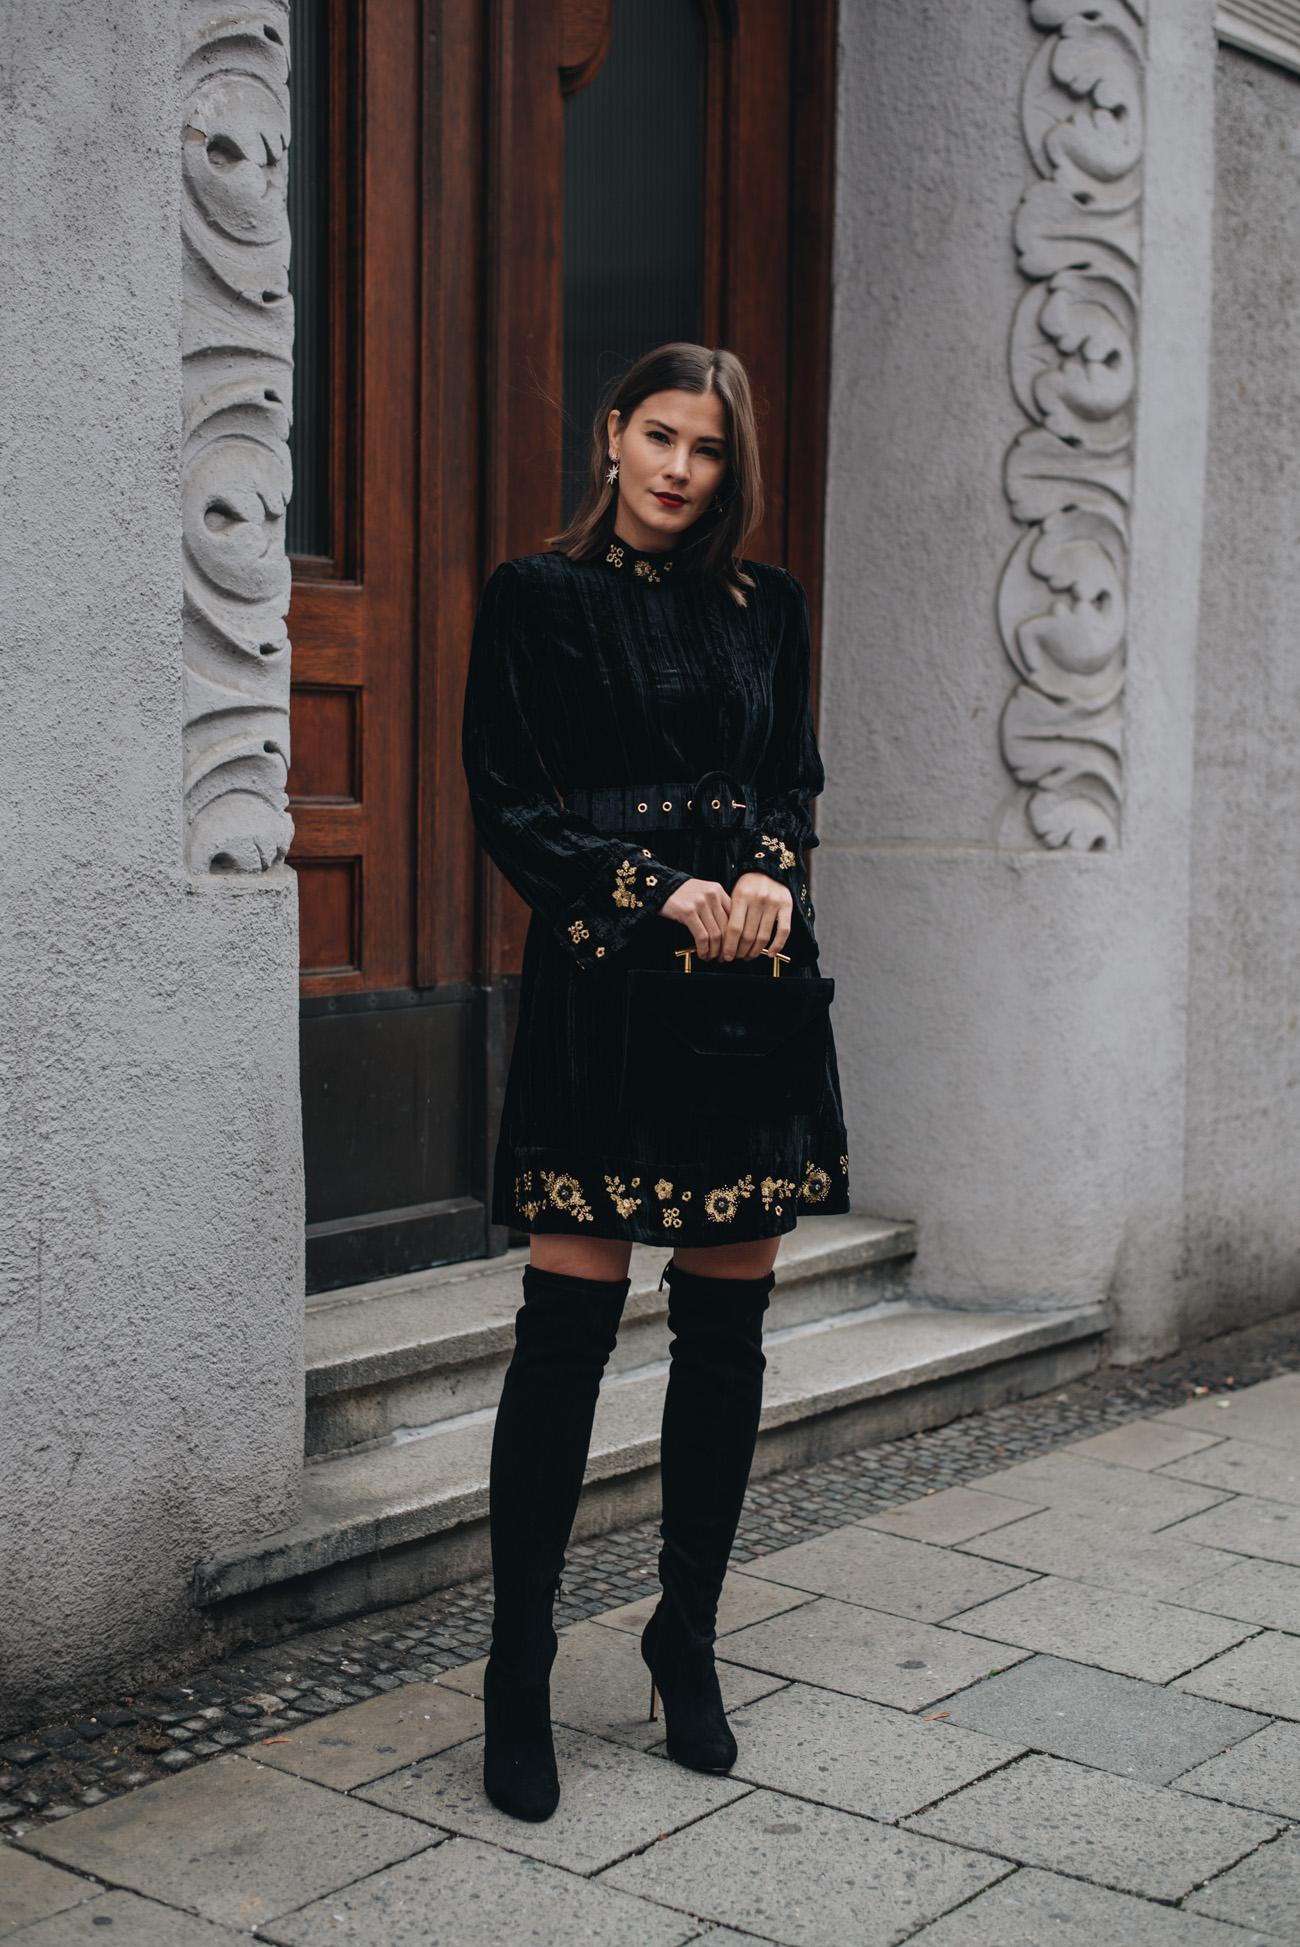 Modetrends 2020: Pom Dresses